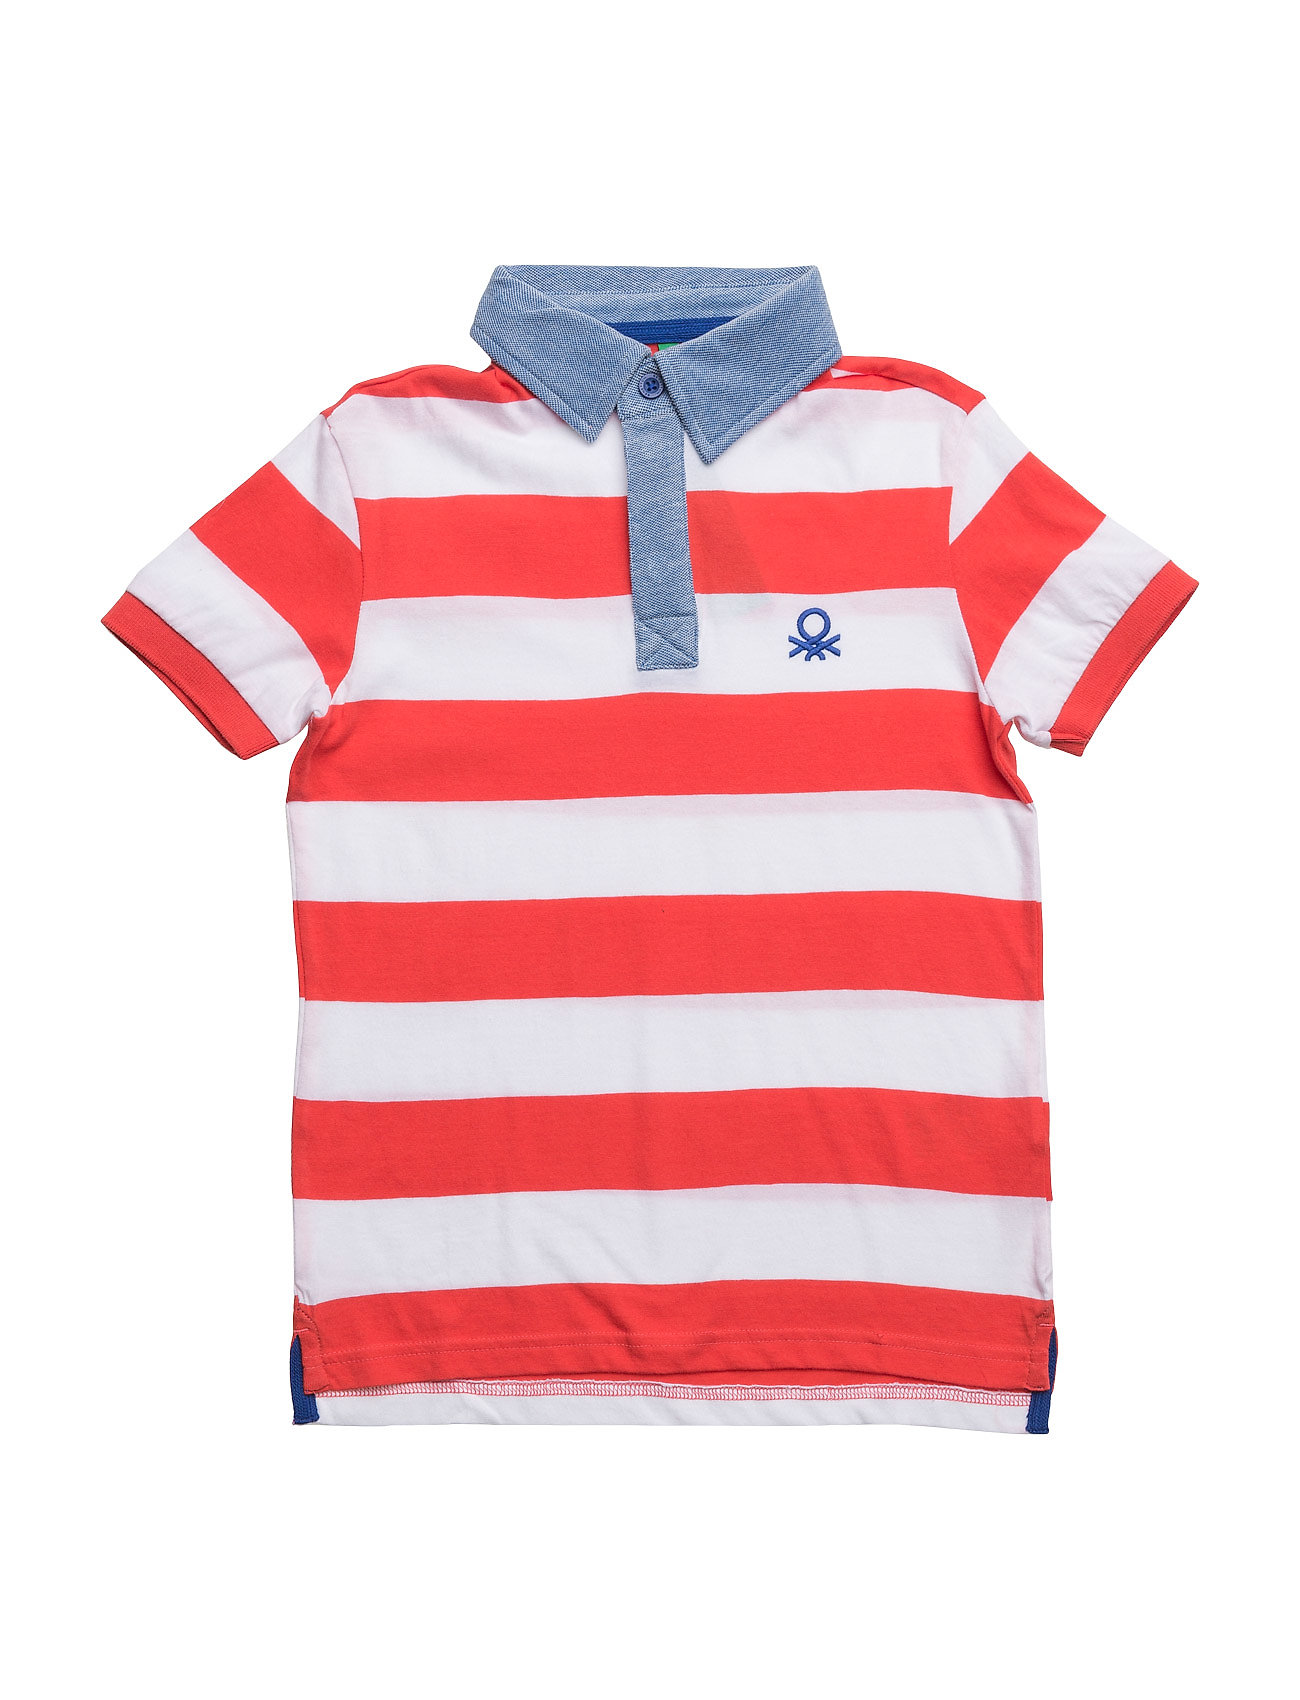 H/S Polo Shirt United Colors of Benetton Kortärmad T-Shirts